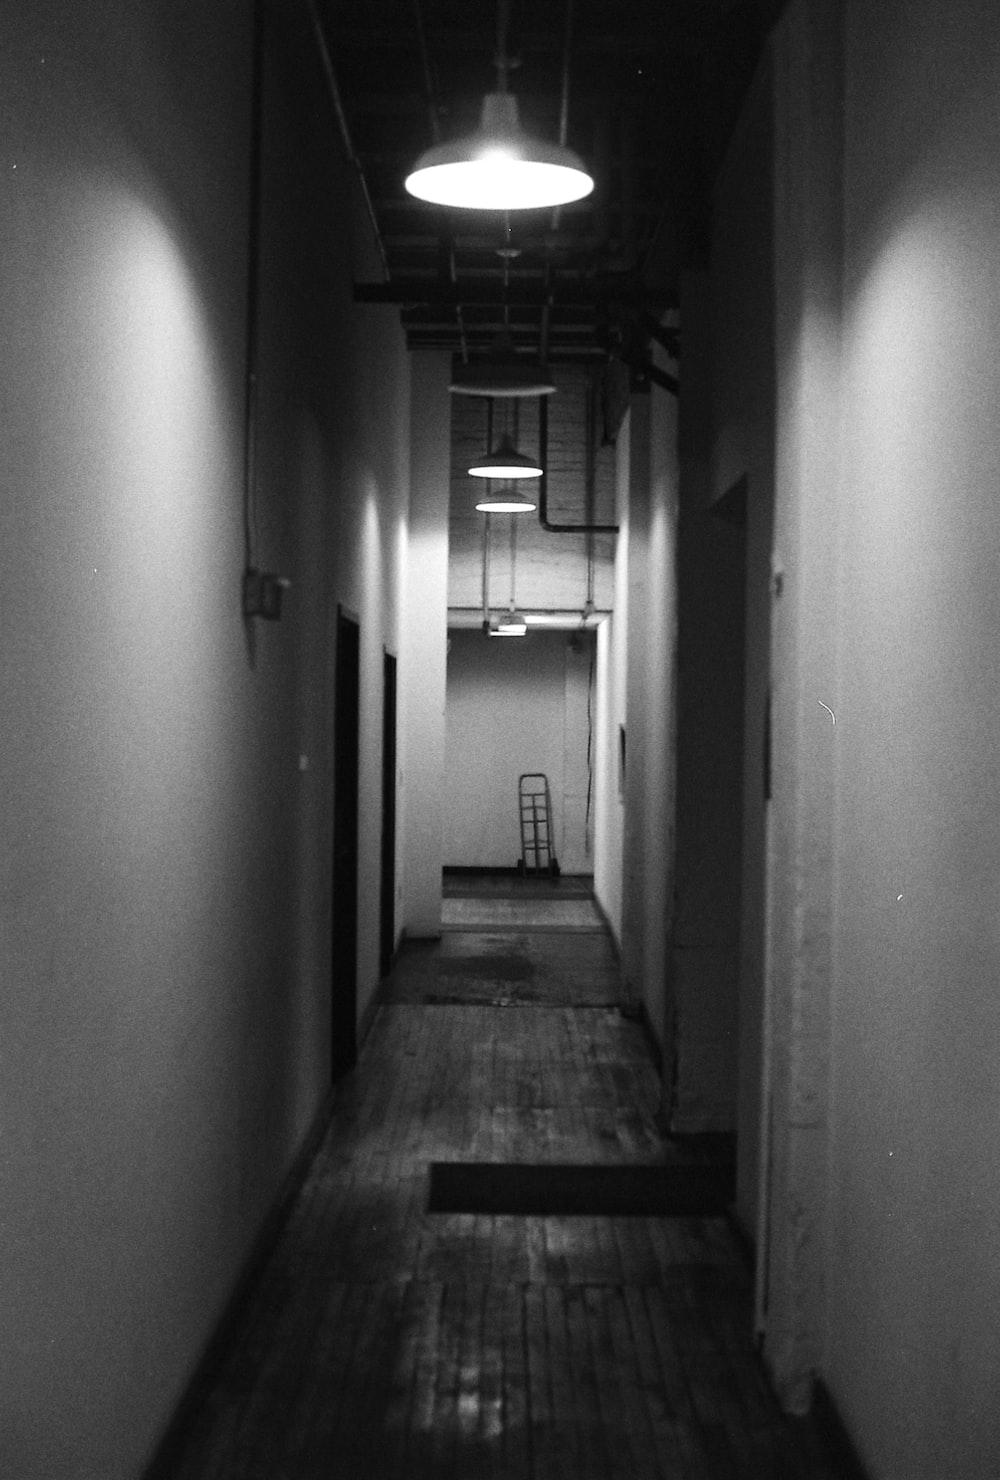 pendant lamp on hallway